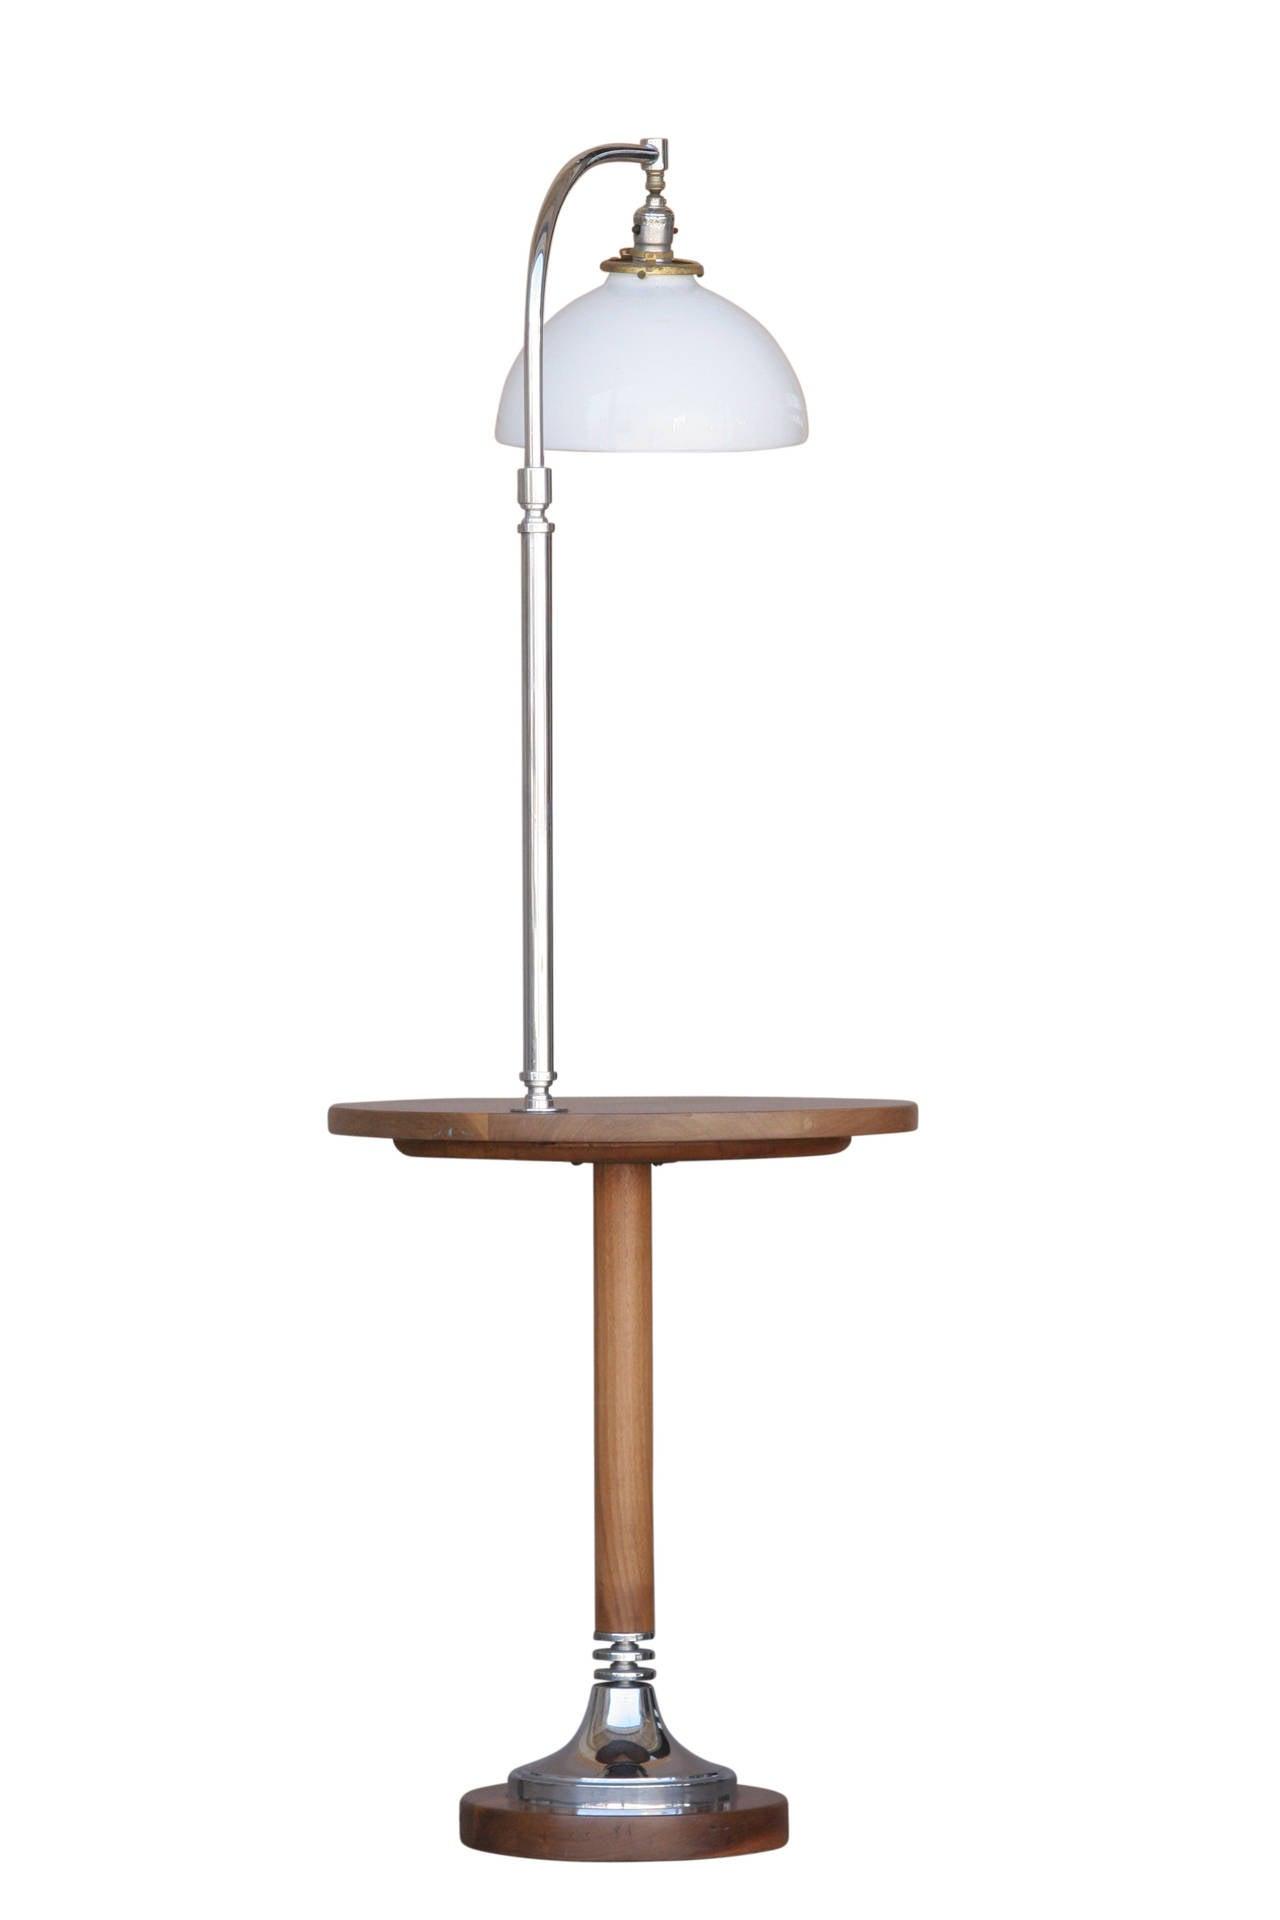 Circa 1930 Streamline Side Table Floor Lamp At 1stdibs